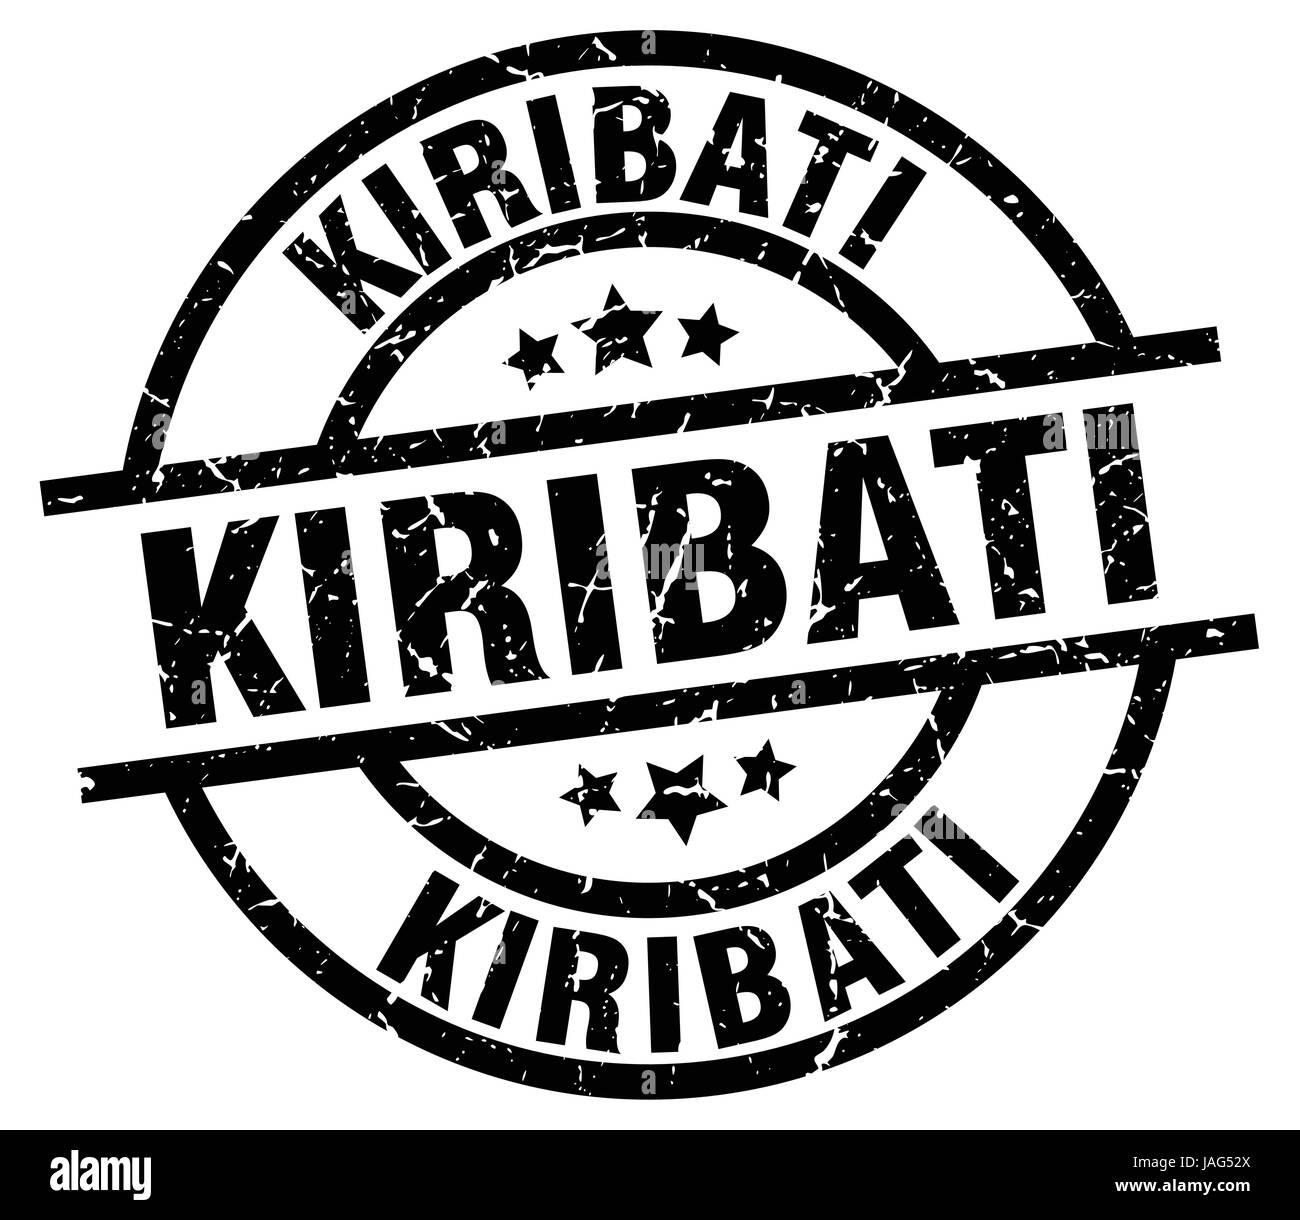 Kiribati black round grunge stamp - Stock Image